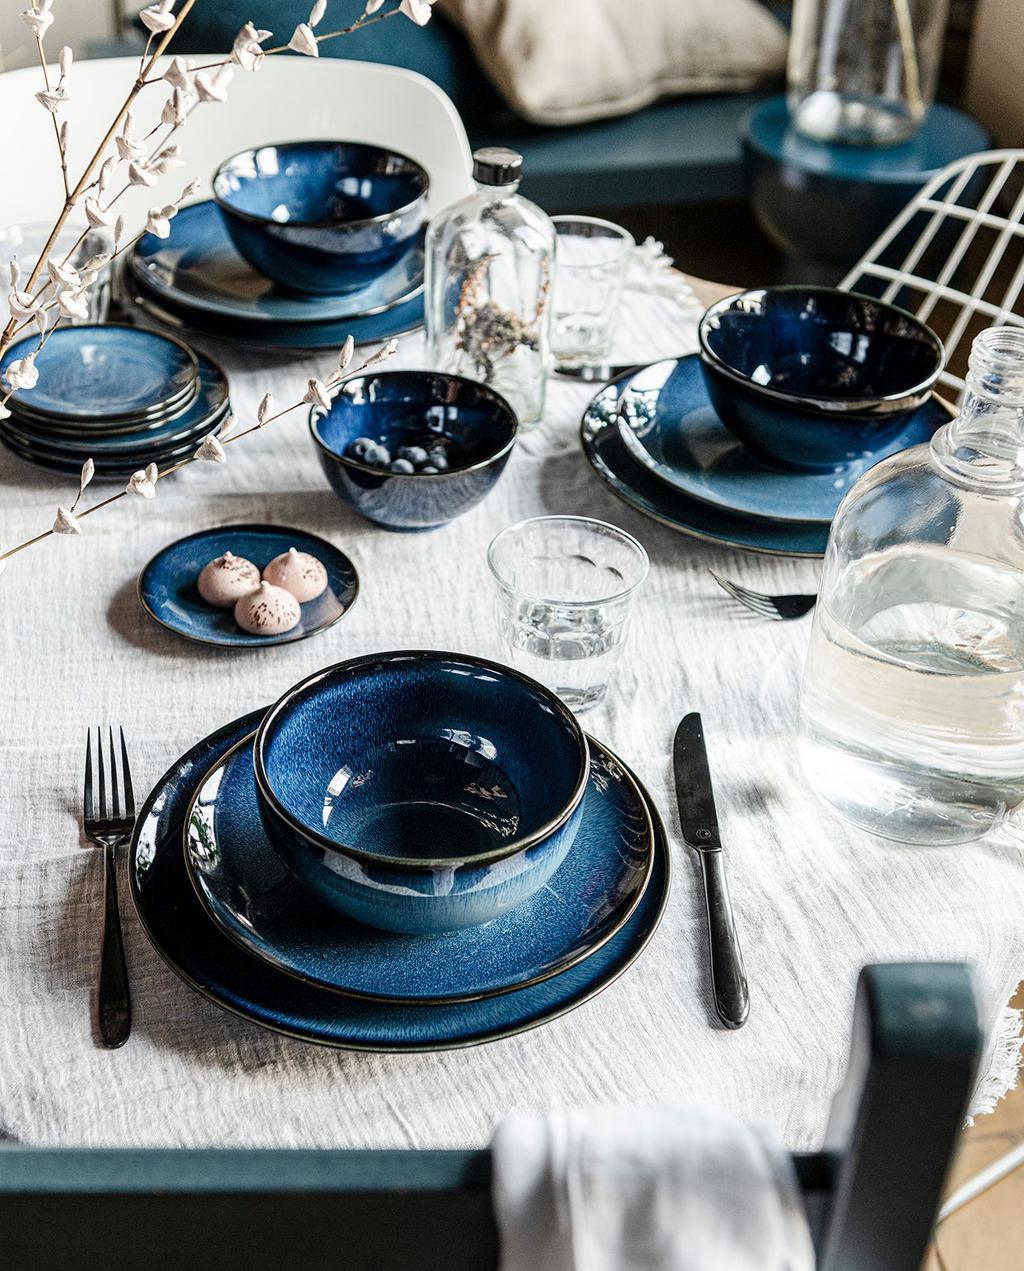 vtwonen 06-2021 | wit gedekte tafel met blauw servies